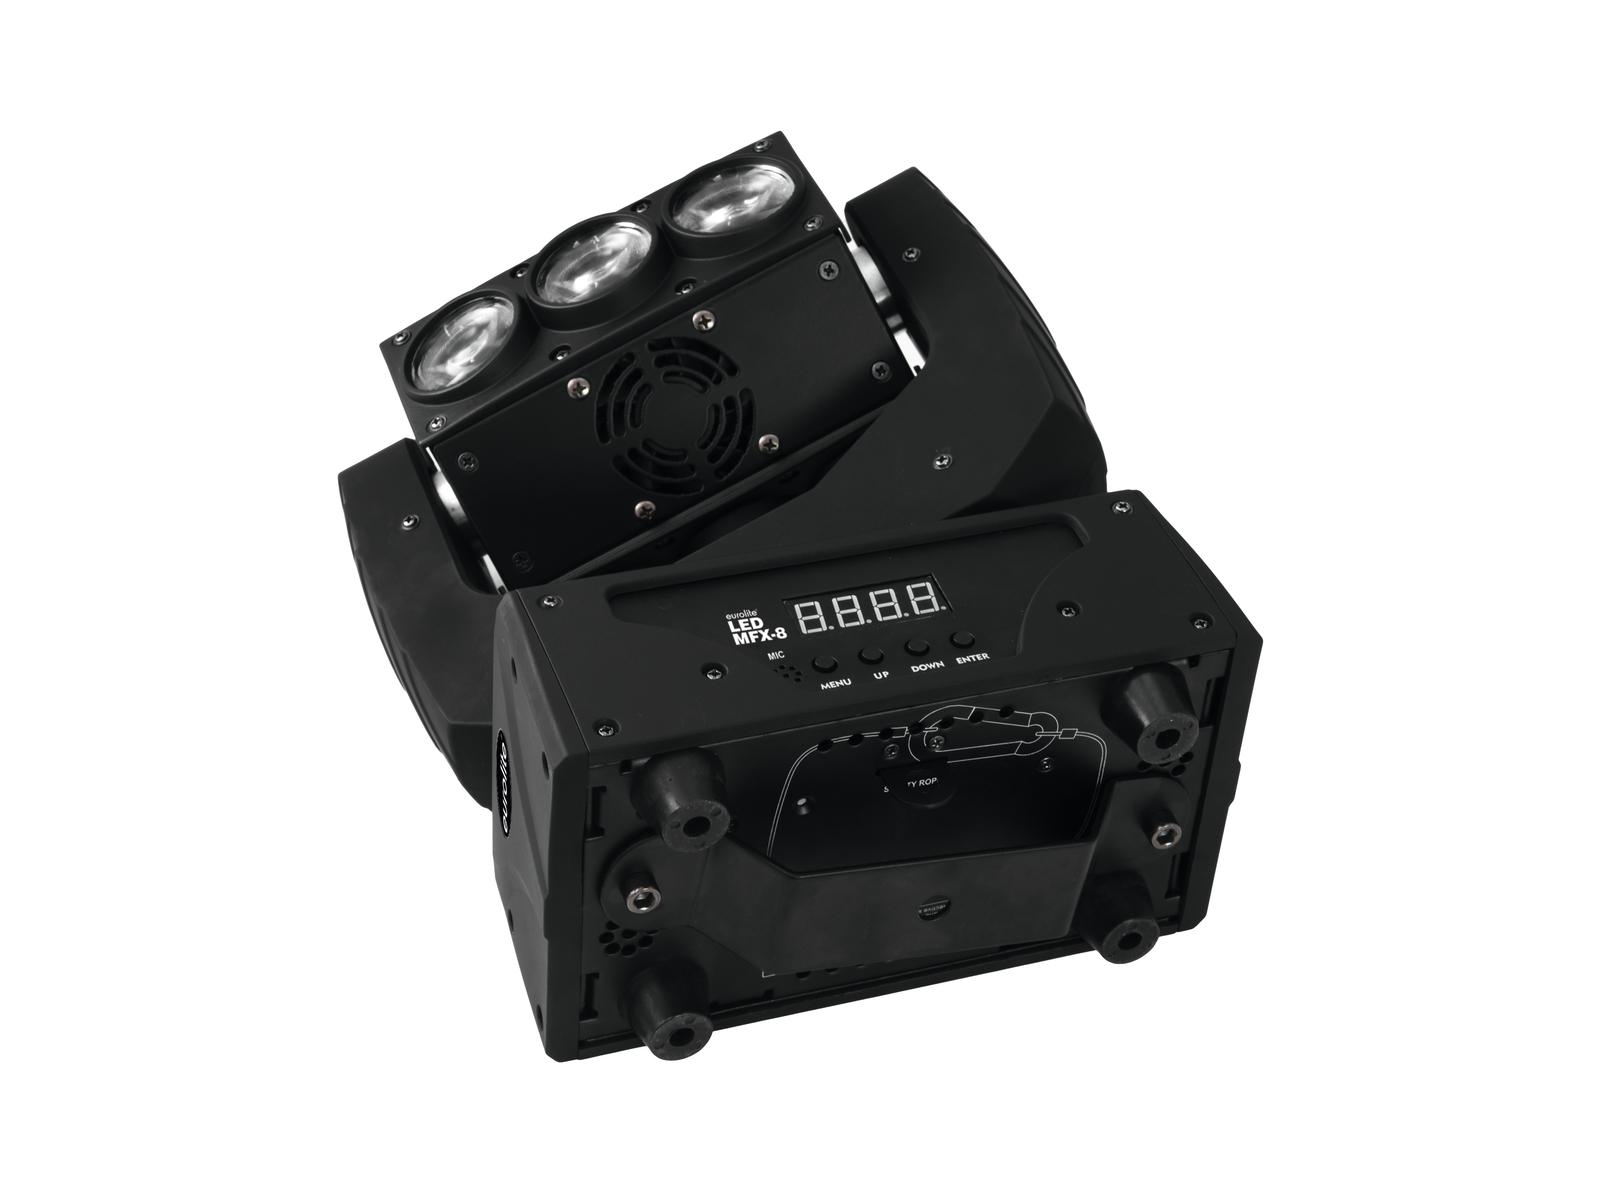 Barra A Led Testa Mobile Moving Head Wash LED MFX-8 DMX 130Watt Eurolite